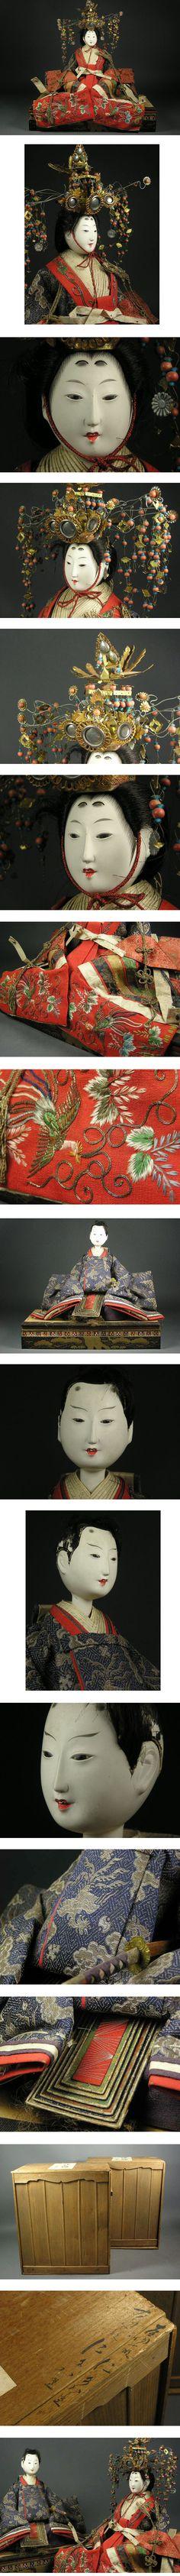 hina dolls Hina Dolls, Art Dolls, Hina Matsuri, Japanese Doll, Asian Doll, Ichimatsu, Masks Art, Japan Art, Nihon